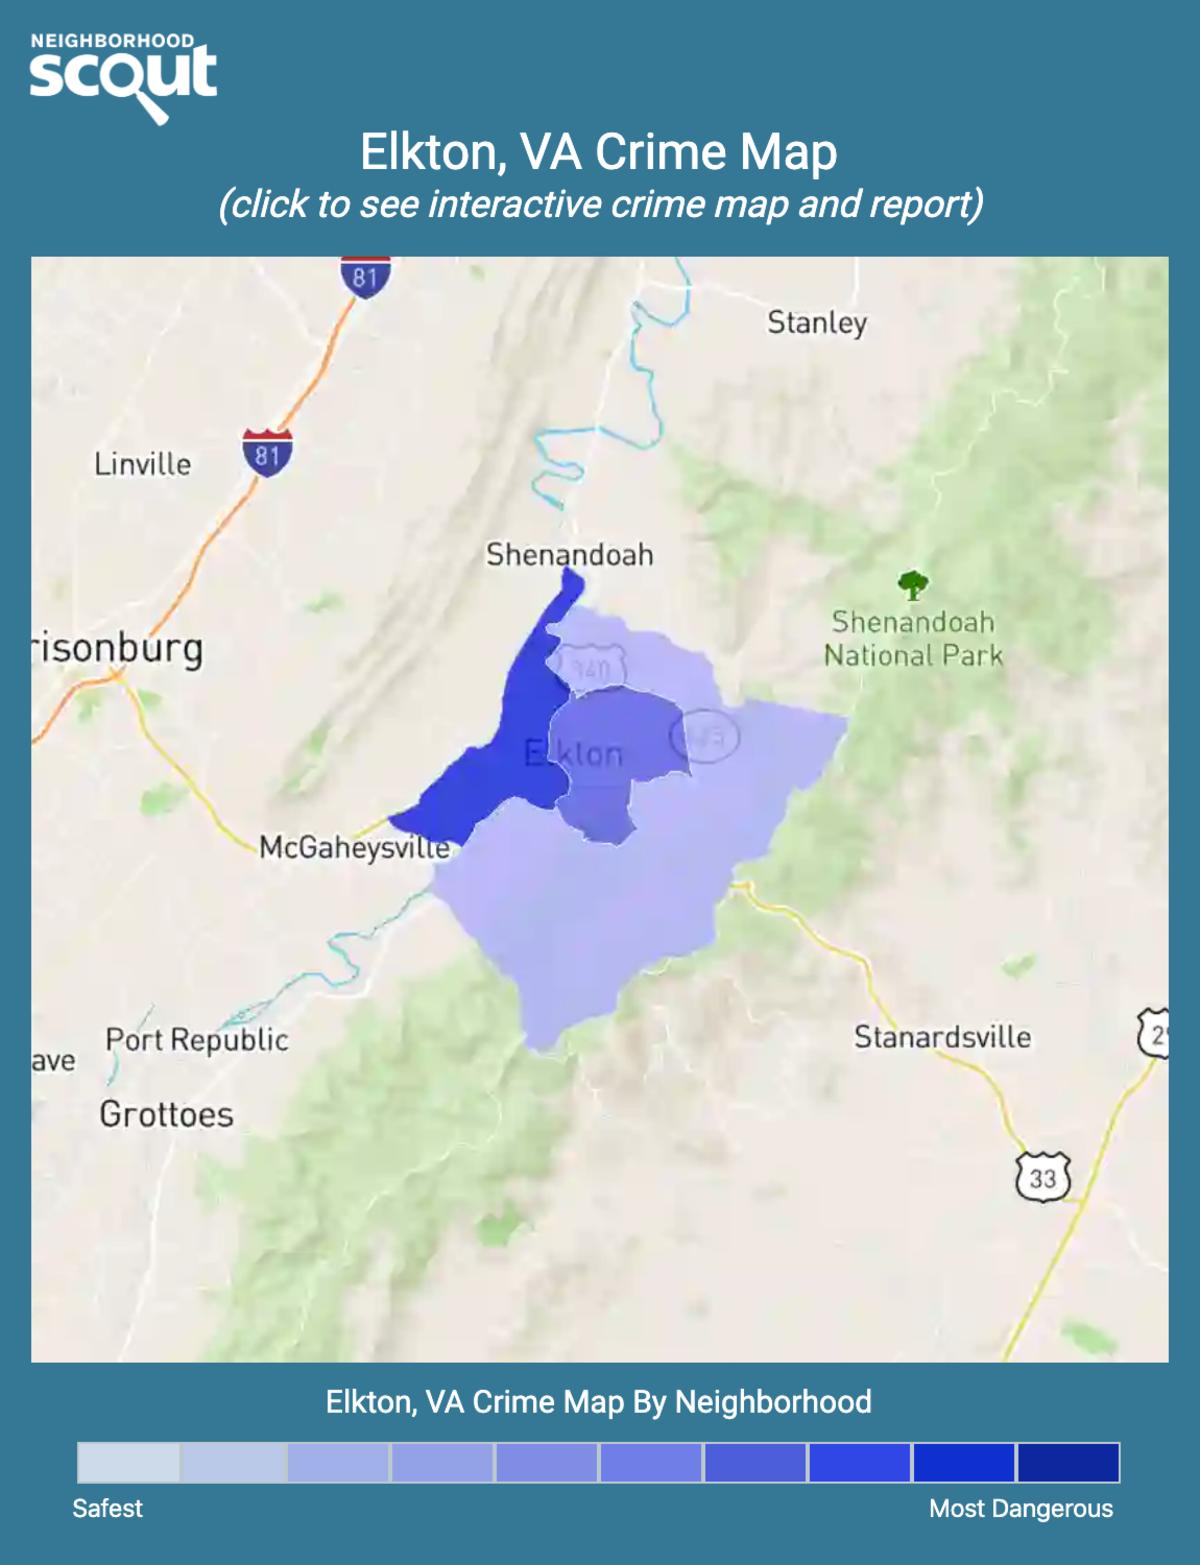 Elkton, Virginia crime map